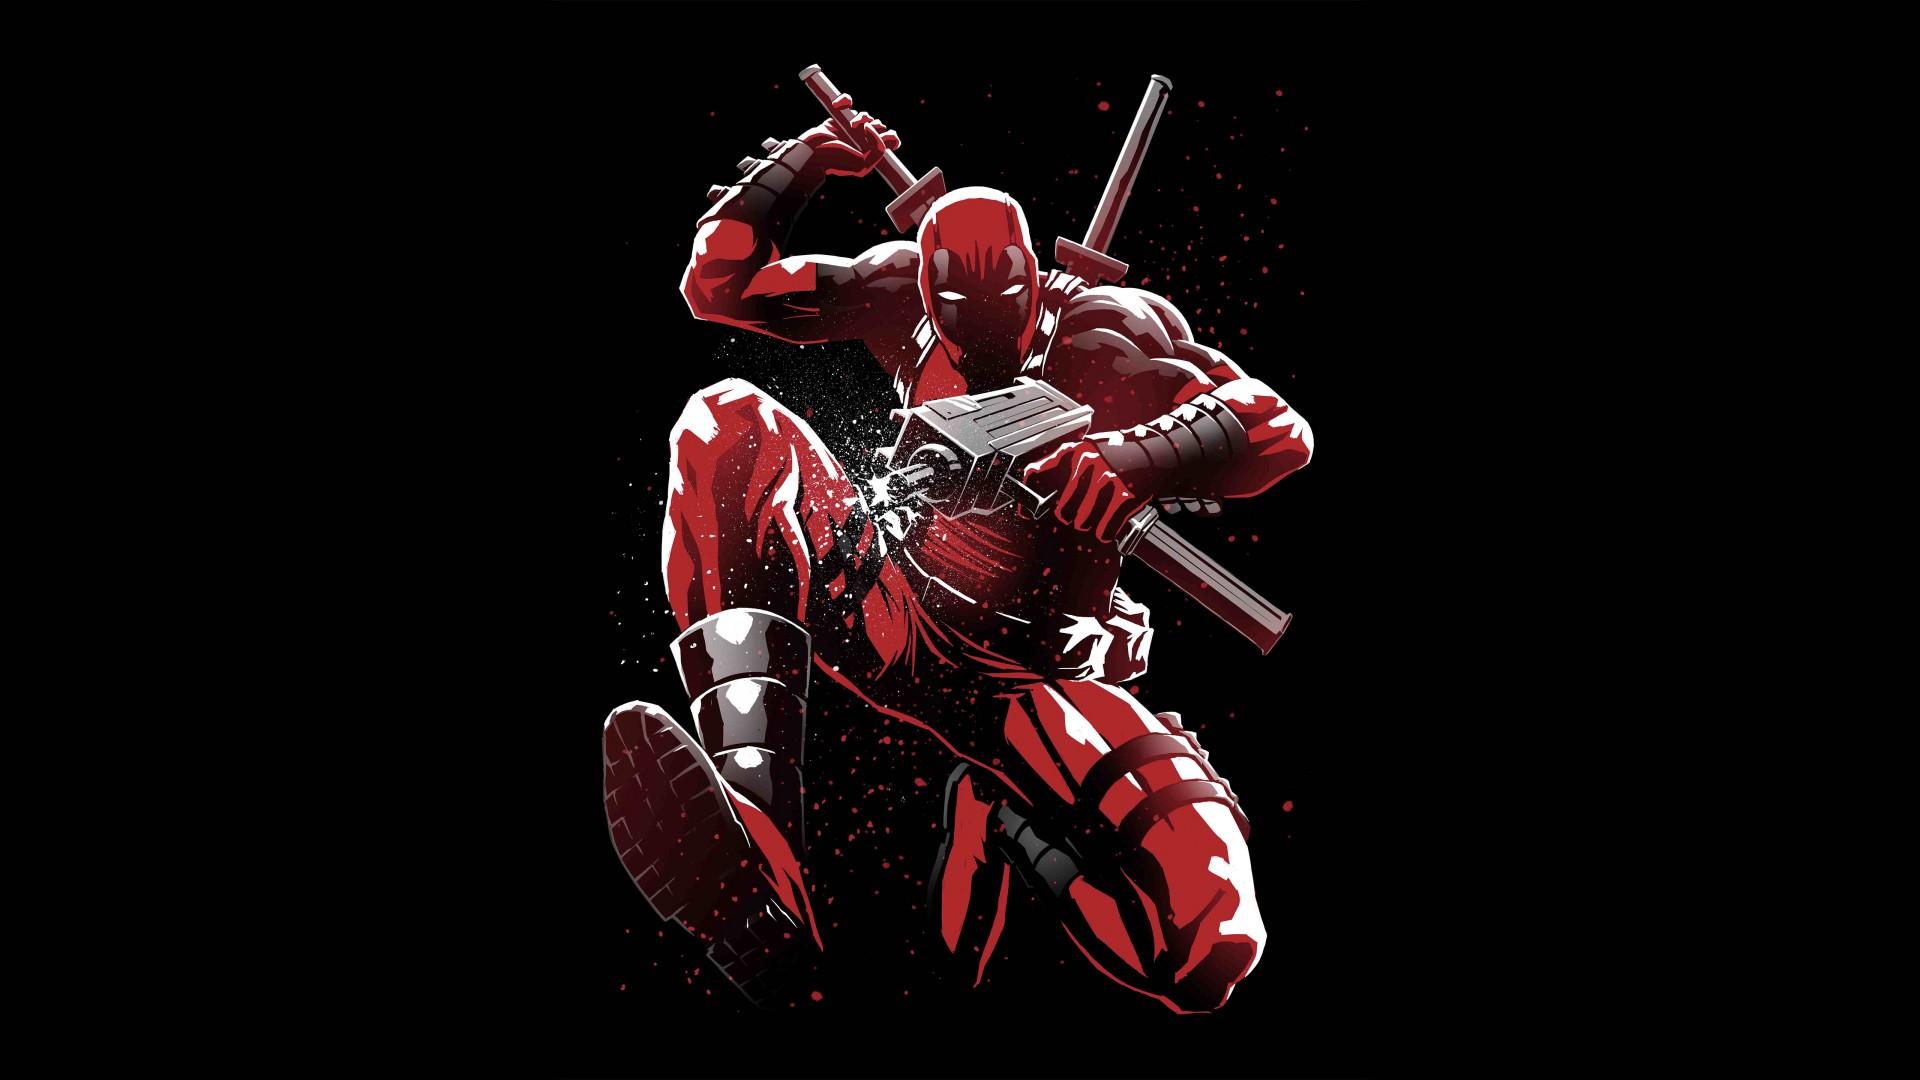 Deadpool Wallpaper For Iphone X Deadpool 5k Wallpapers Hd Wallpapers Id 27717